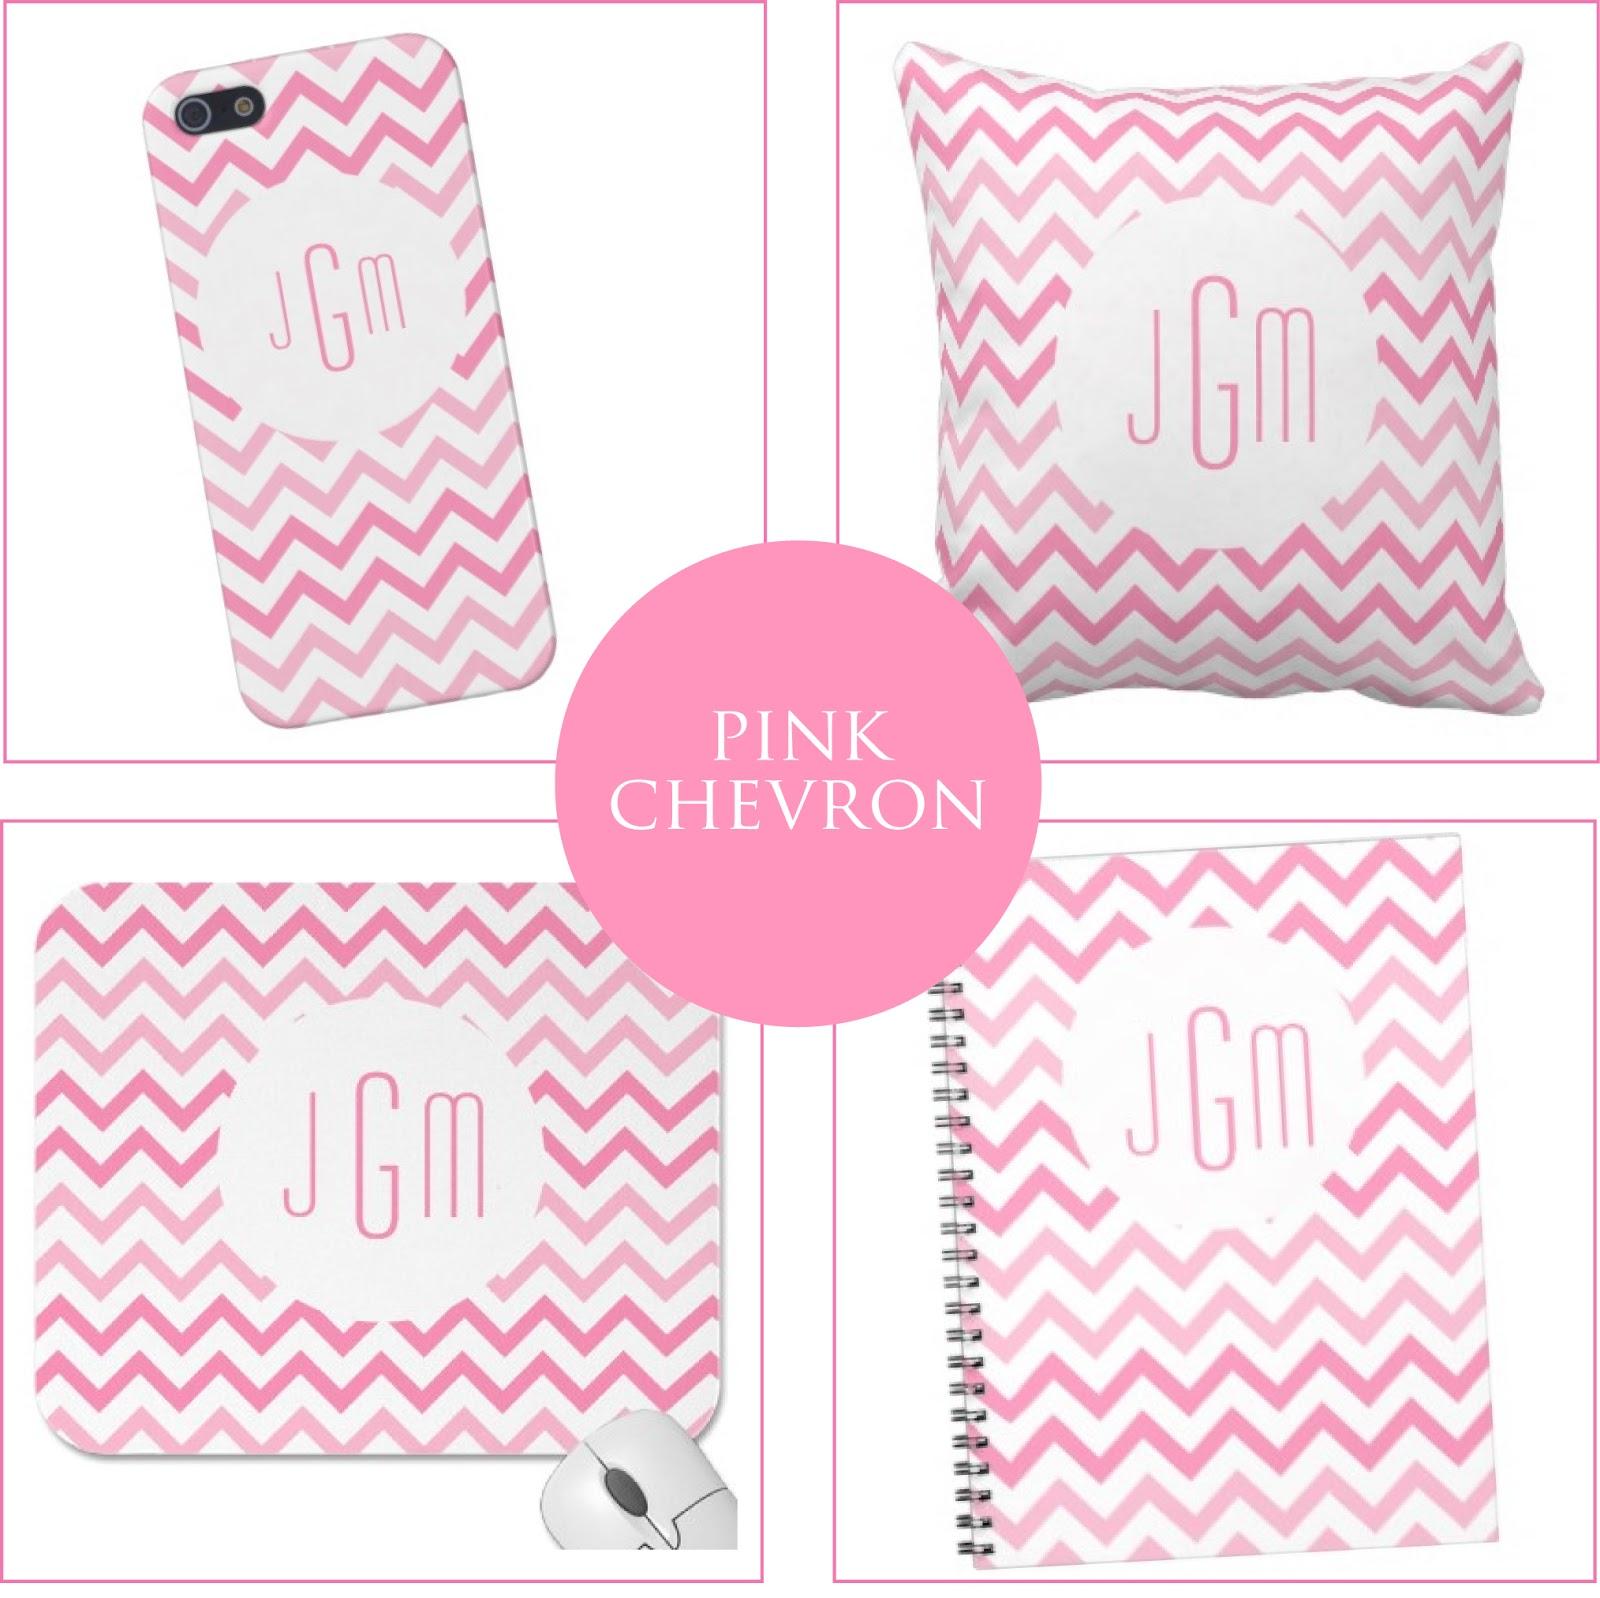 Pink Chevron + Monogram Goodies from Jessica Marie Design